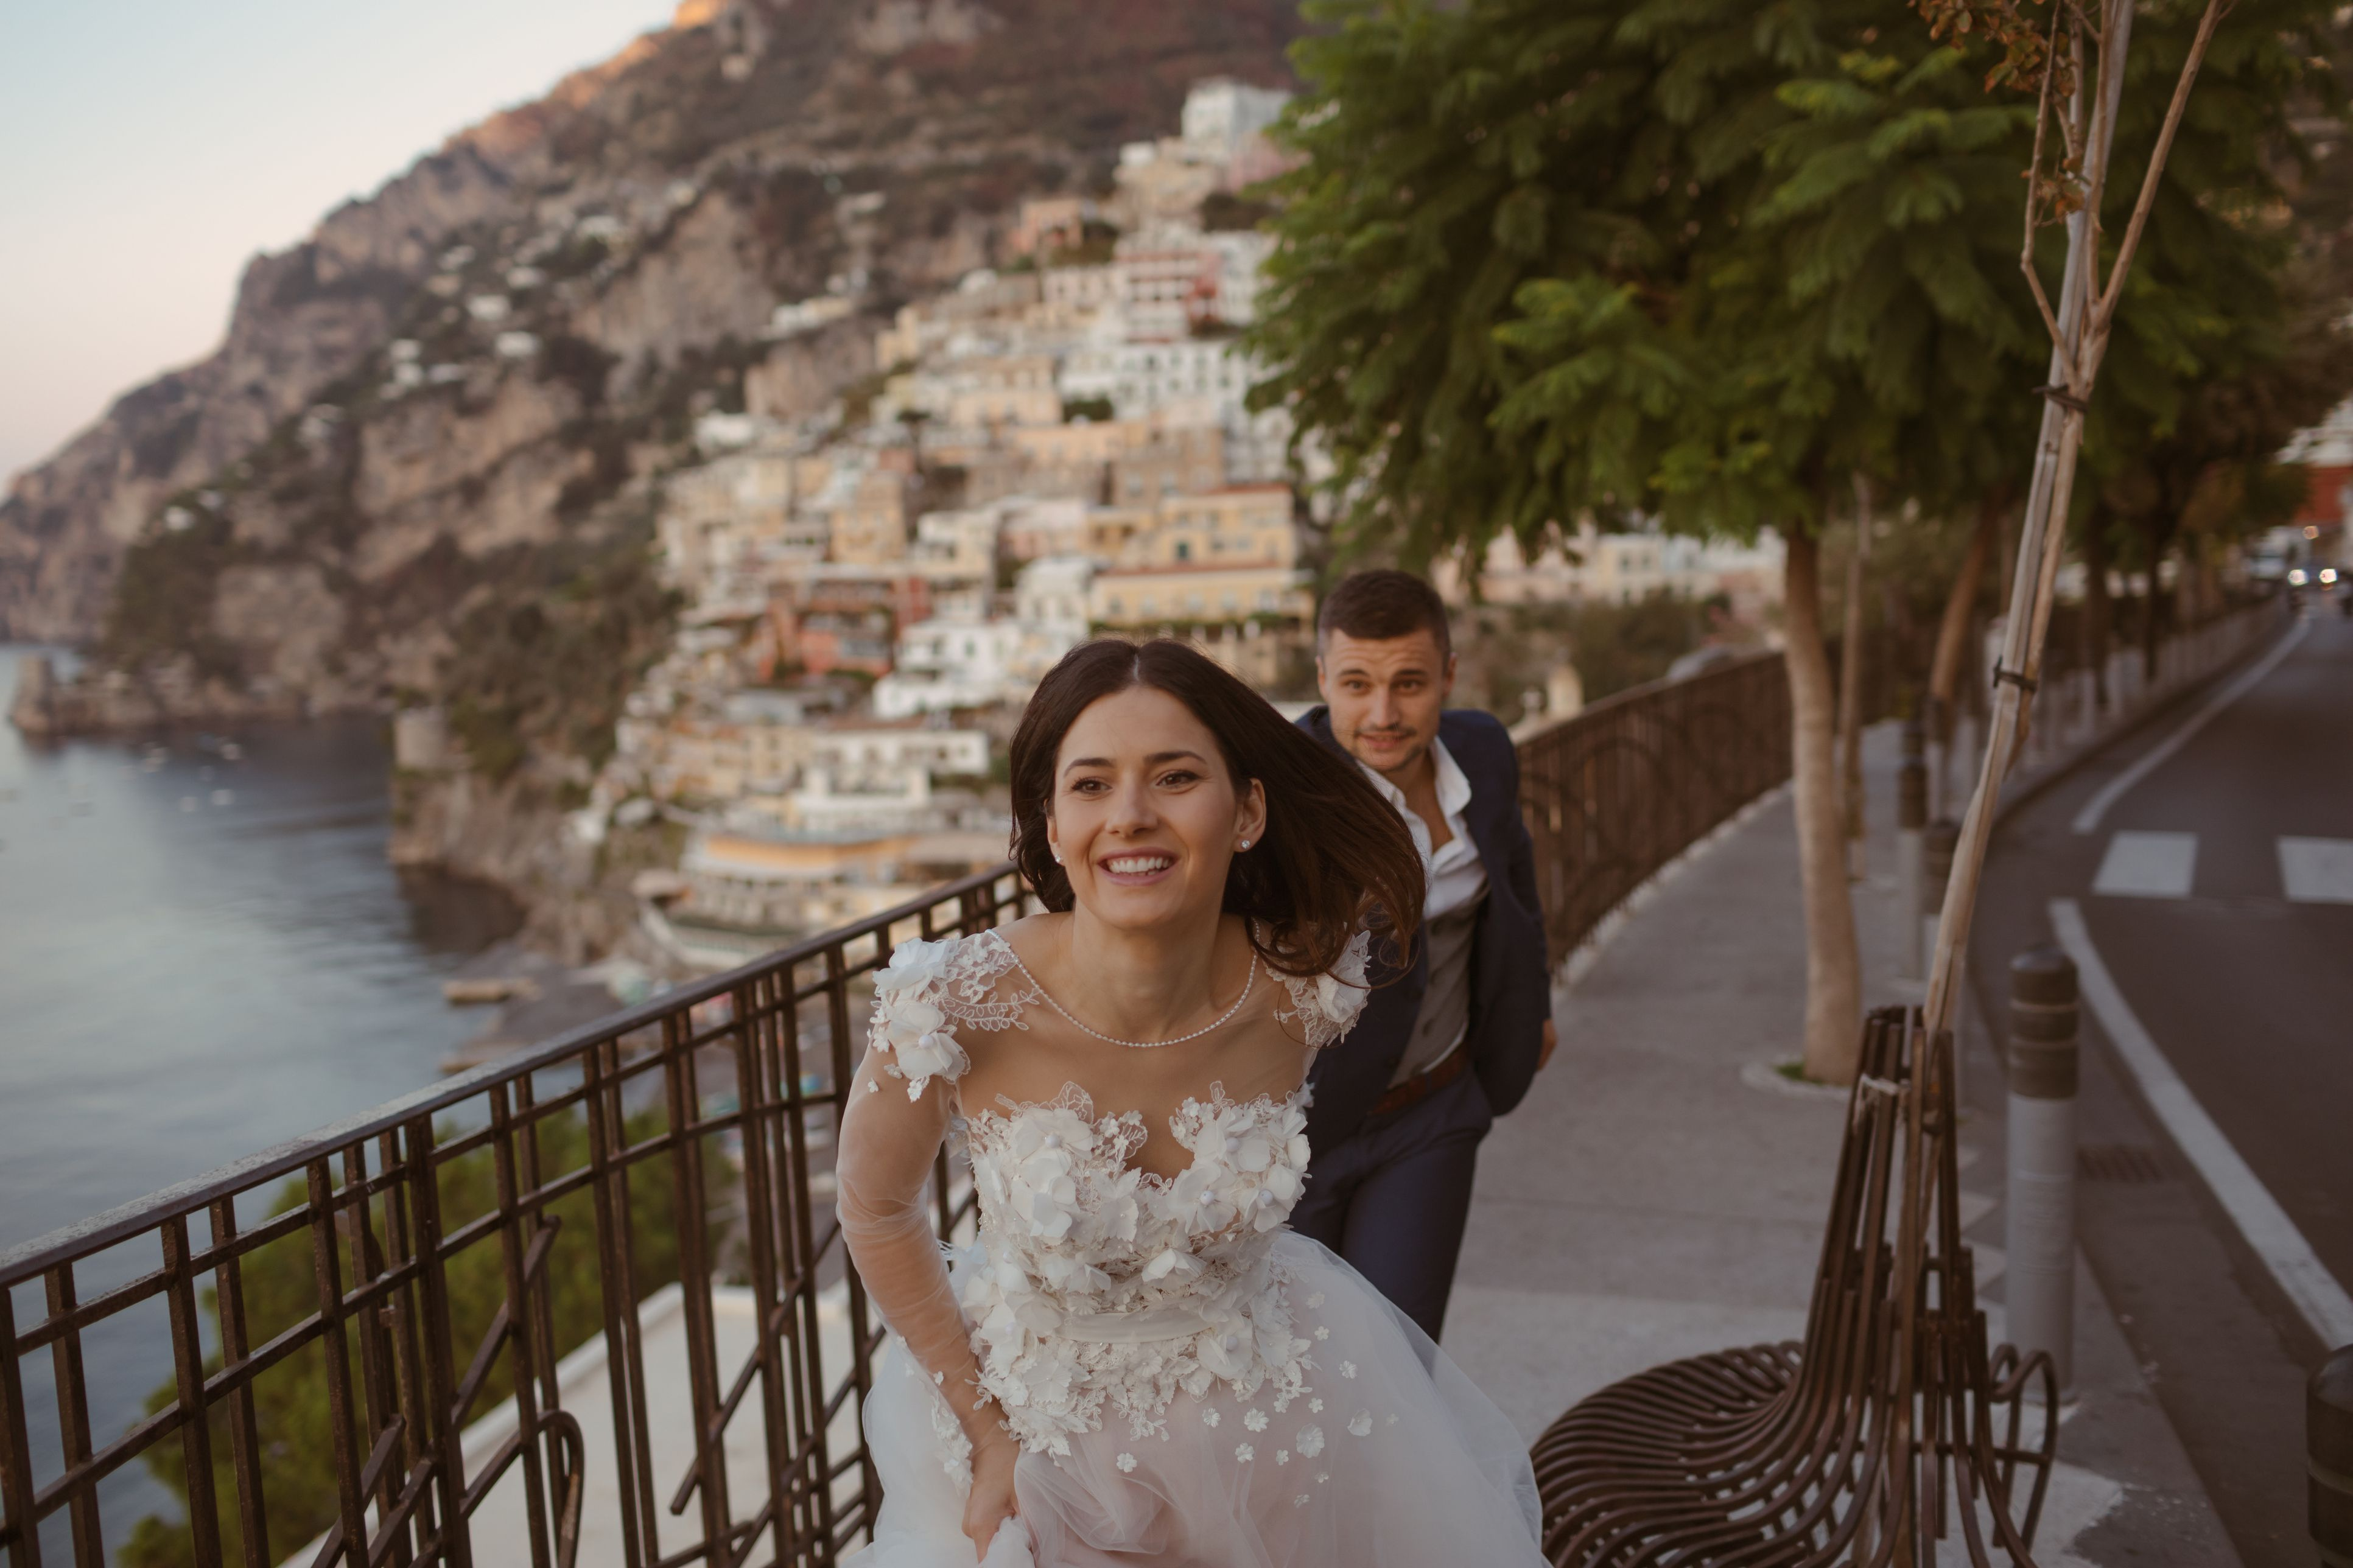 Checklist for Planning a Destination Wedding